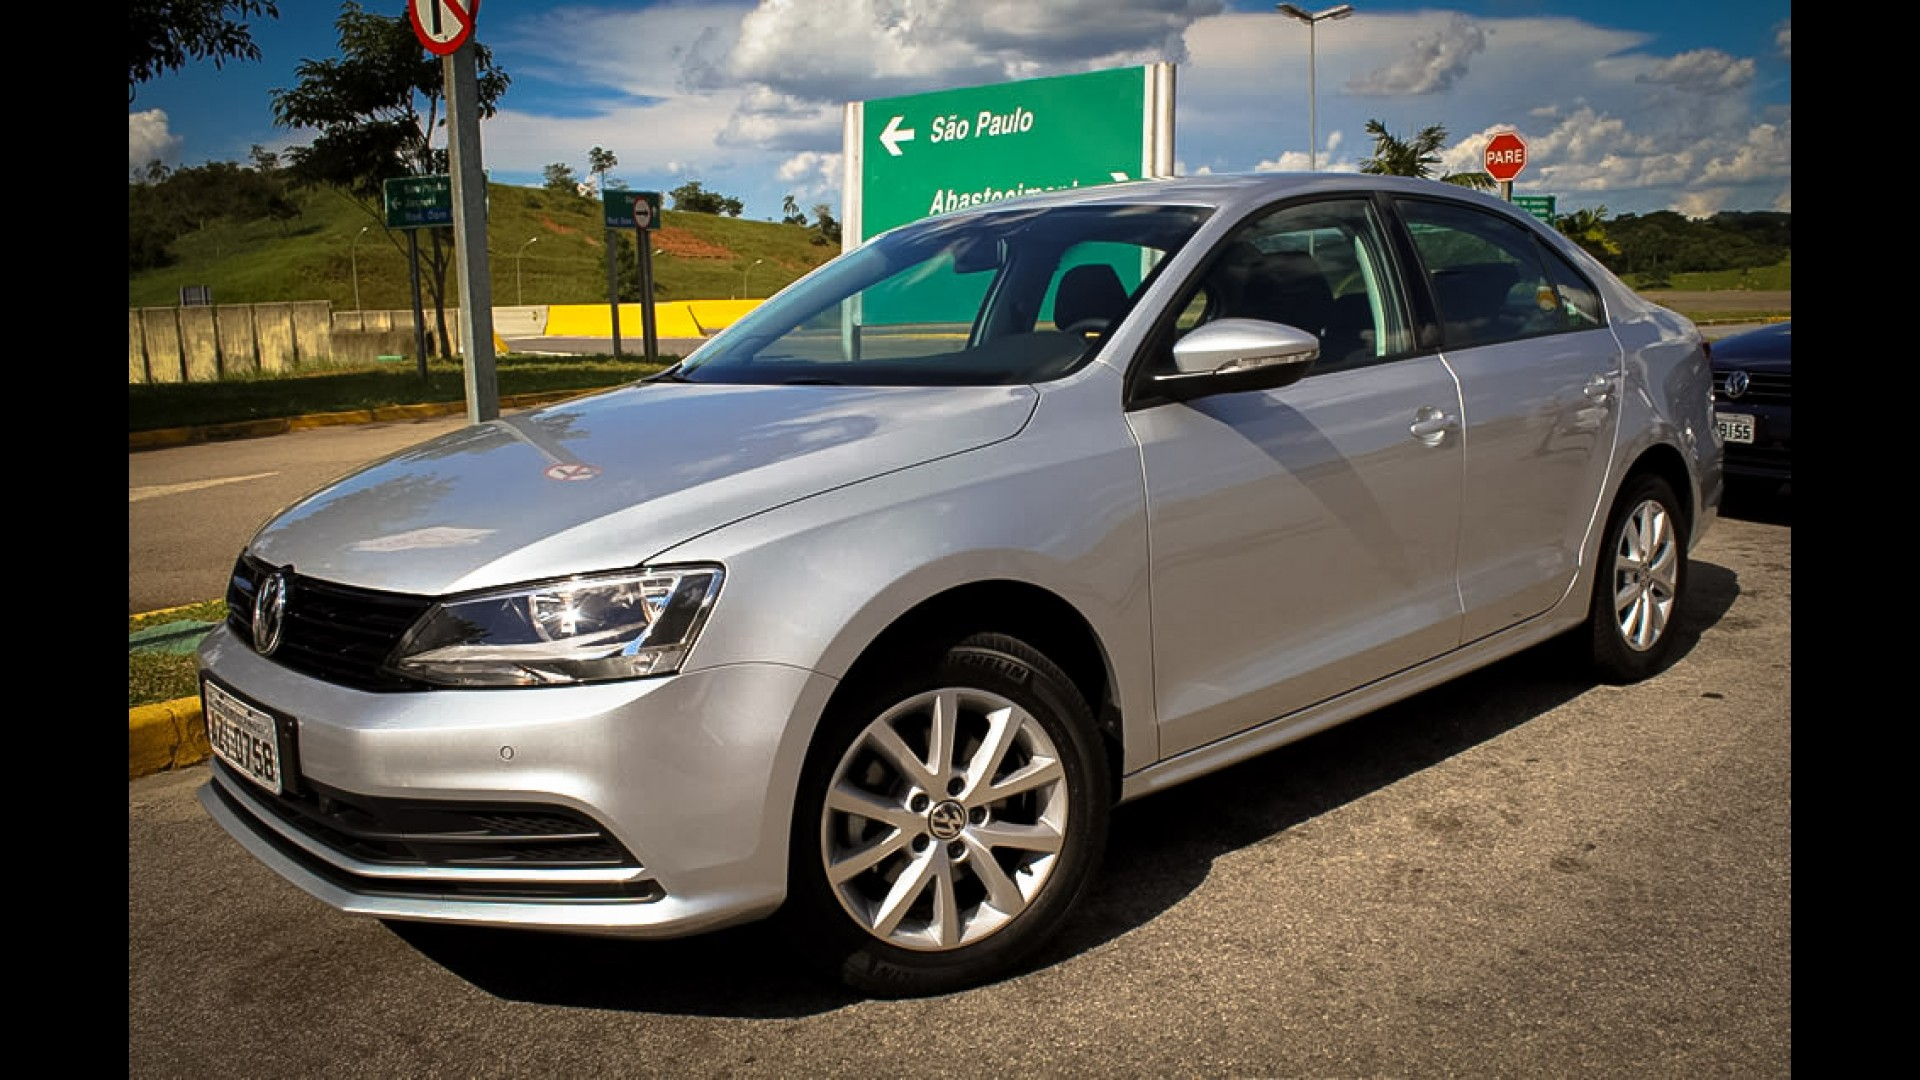 to recalls sel h headlight software glitch recalled fix jetta news notes volkswagen drive